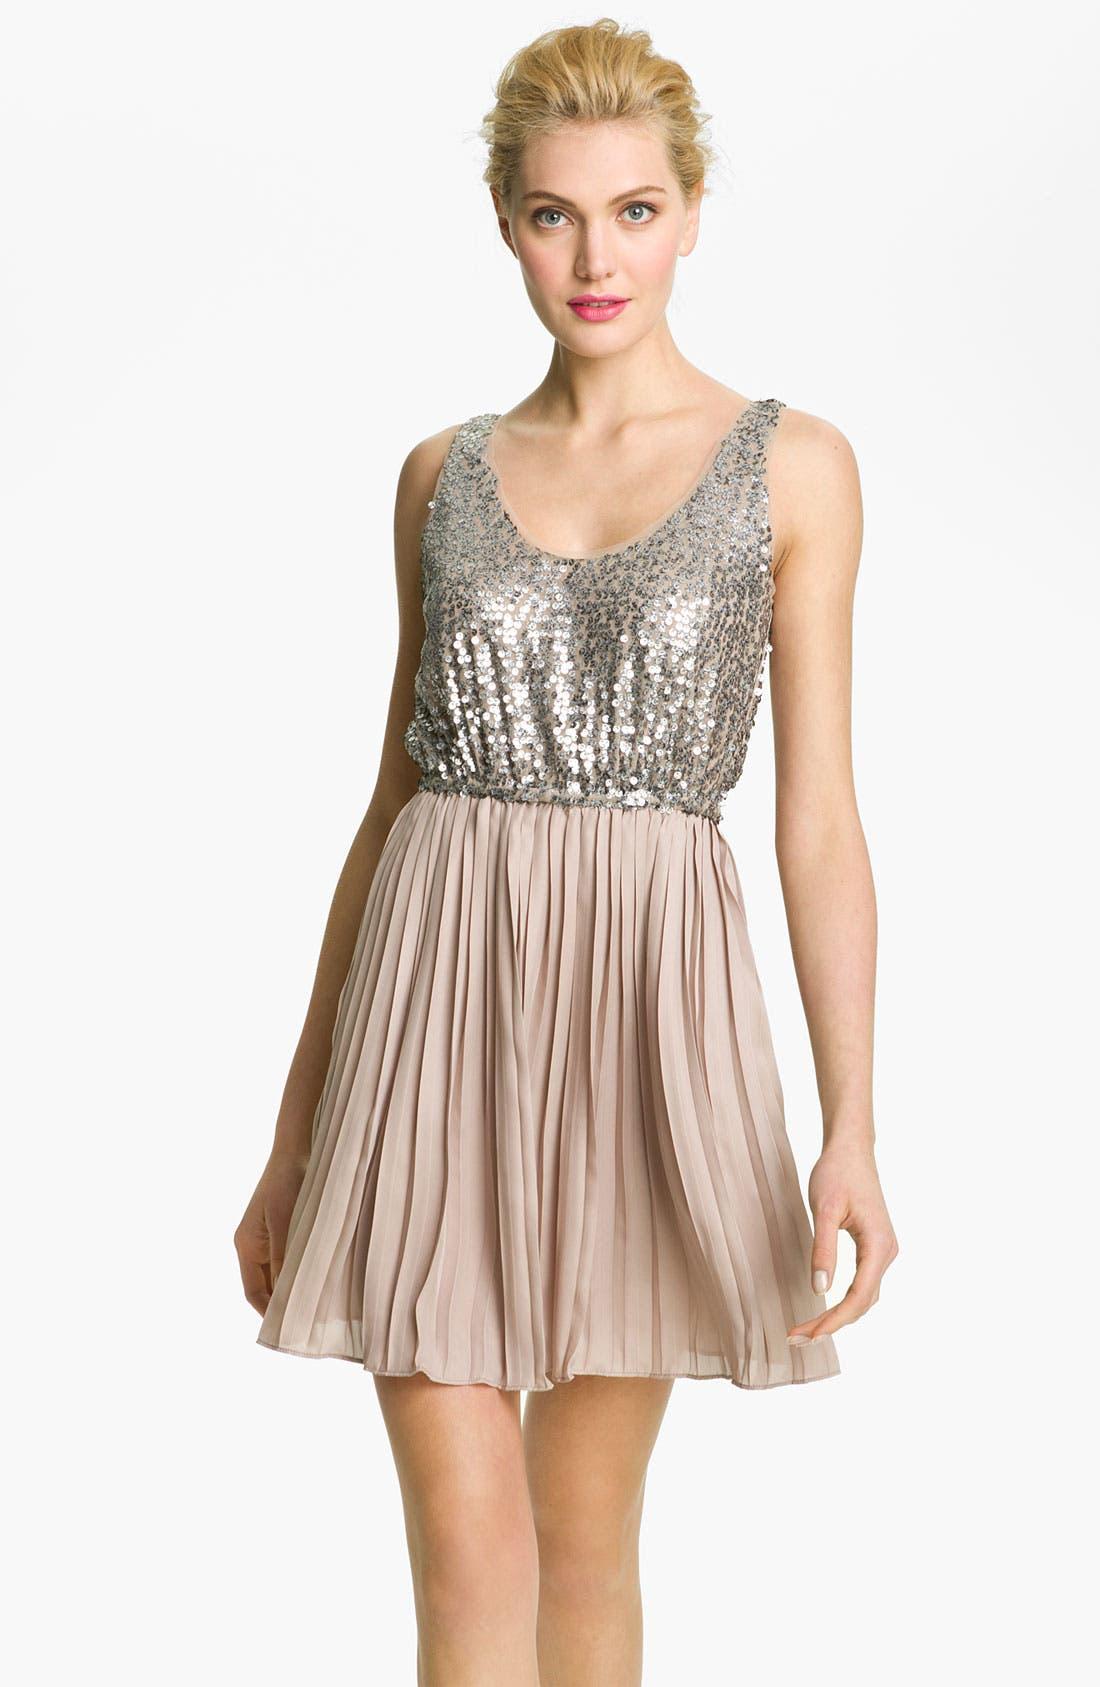 Main Image - BB Dakota 'Olsen' Sequin & Chiffon Blouson Dress